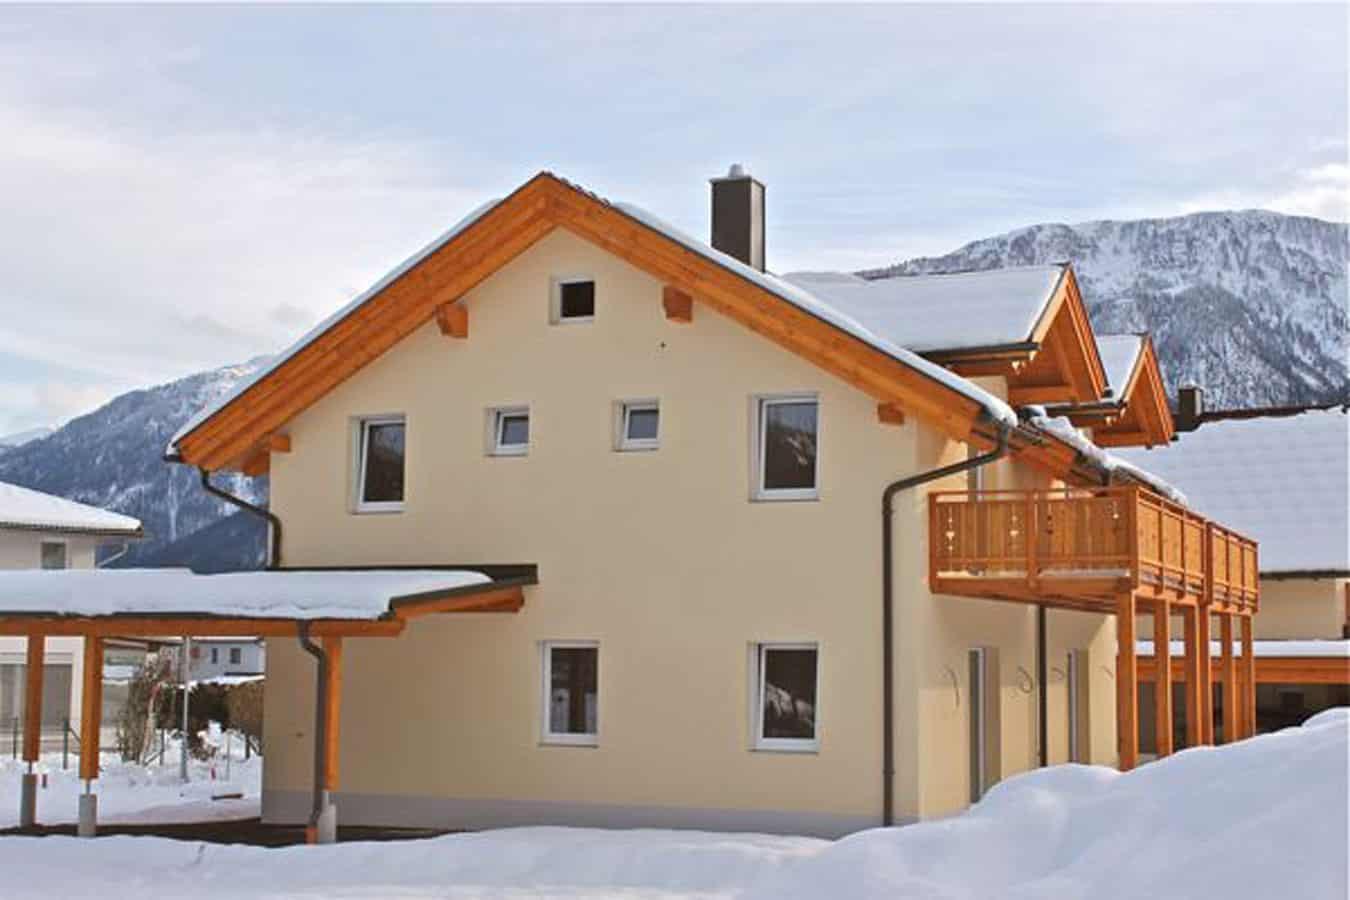 villa-paul-impressie-2-villa-exterieur-2-kwo-villa